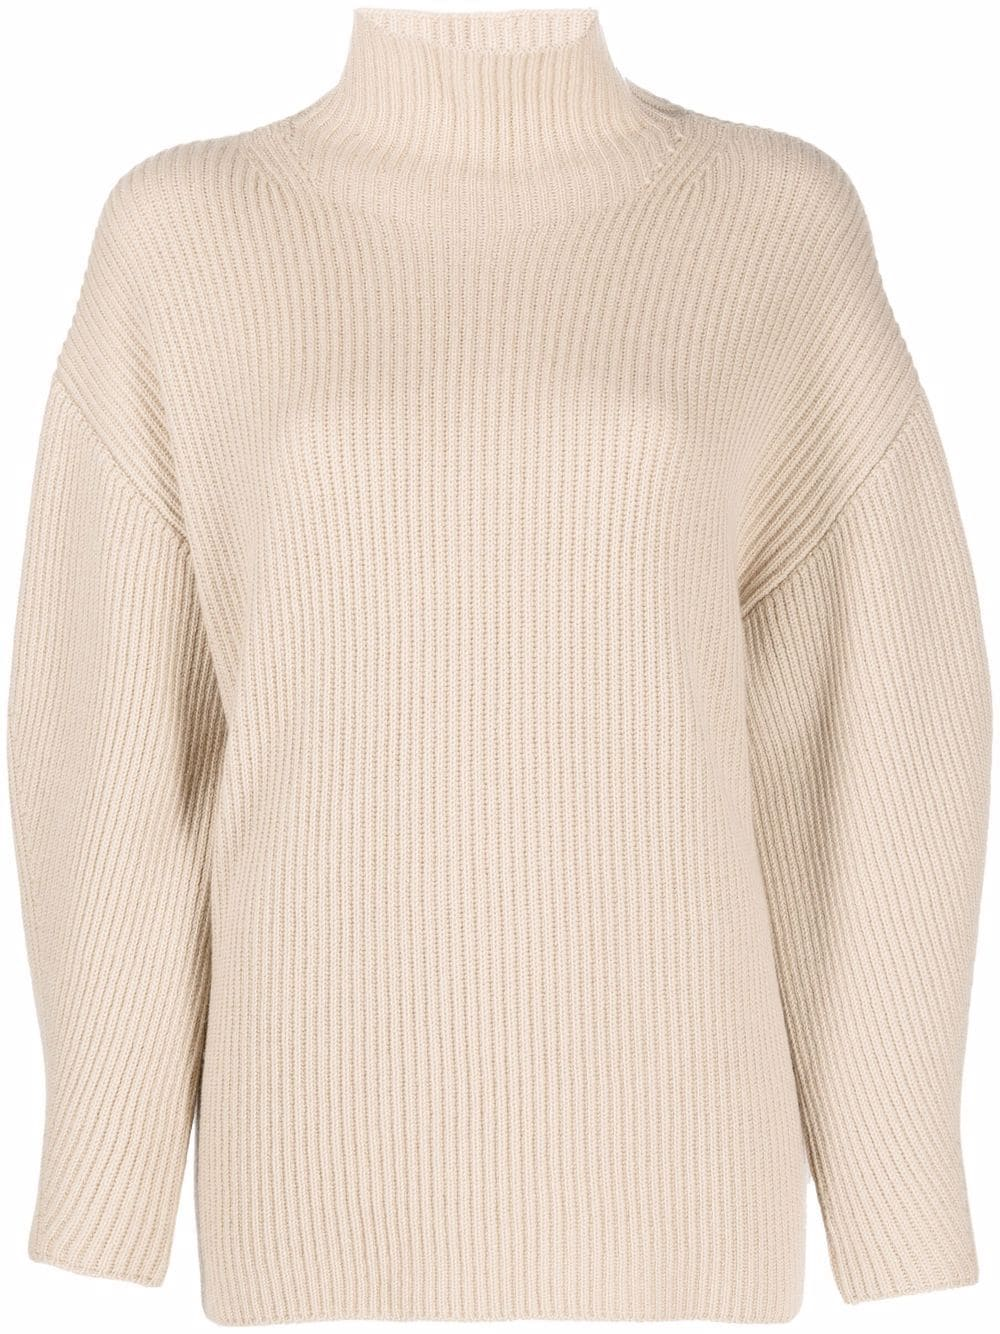 Fedeli roll-neck cashmere jumper - Nude